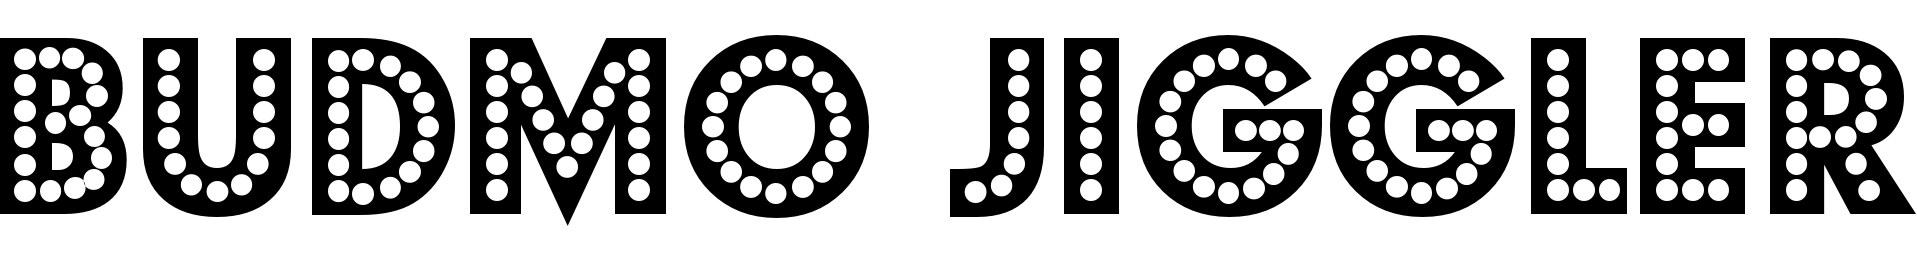 Budmo Jiggler